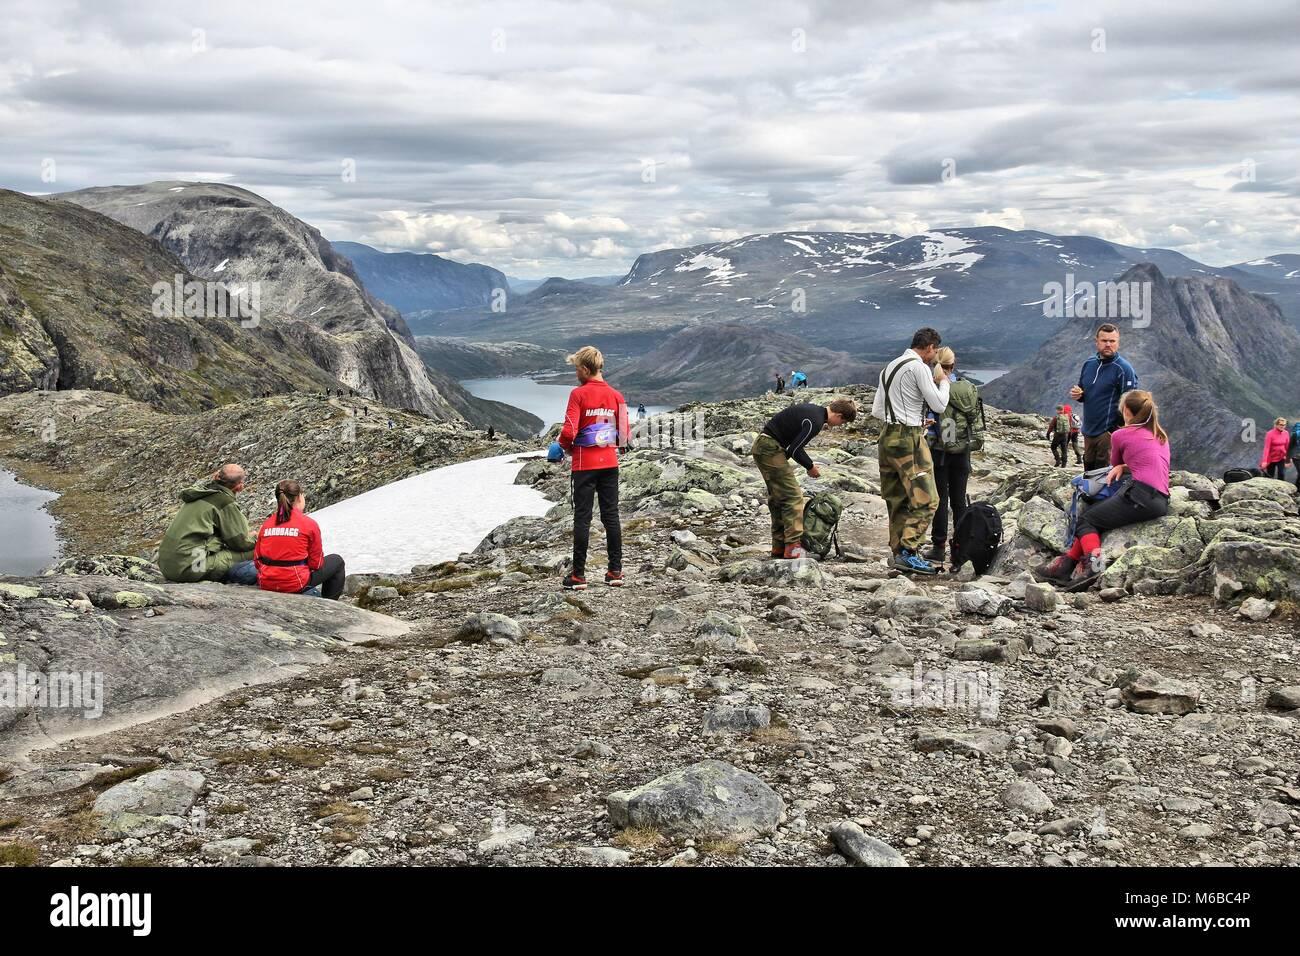 JOTUNHEIMEN, NORWAY - AUGUST 1, 2015: People rest at Besseggen trail in Jotunheimen National Park, Norway. Norway - Stock Image